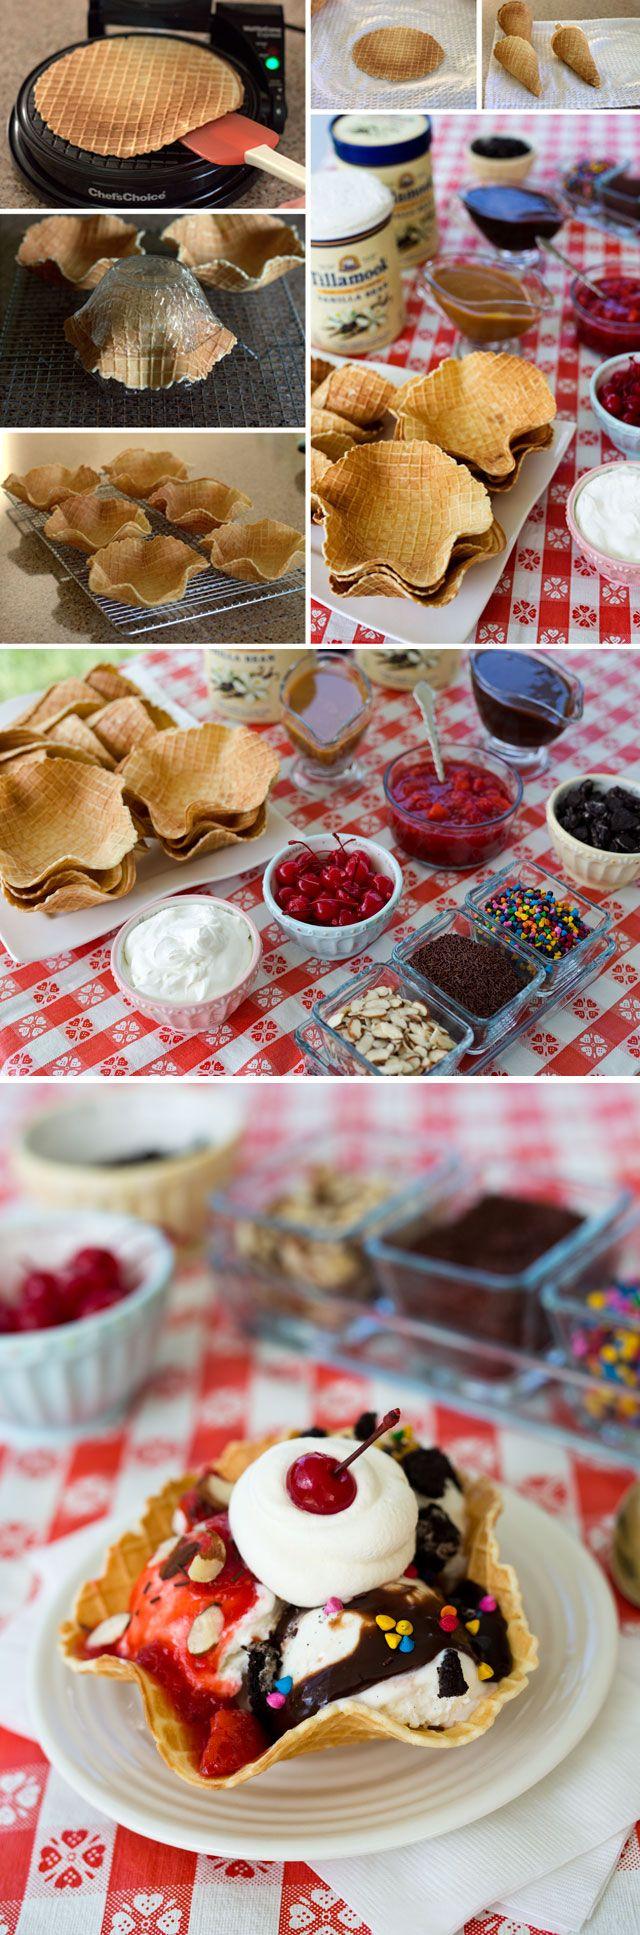 ice cream waffle bowls and cones rezept eis waffeln kuchen rezepte und s e desserts. Black Bedroom Furniture Sets. Home Design Ideas